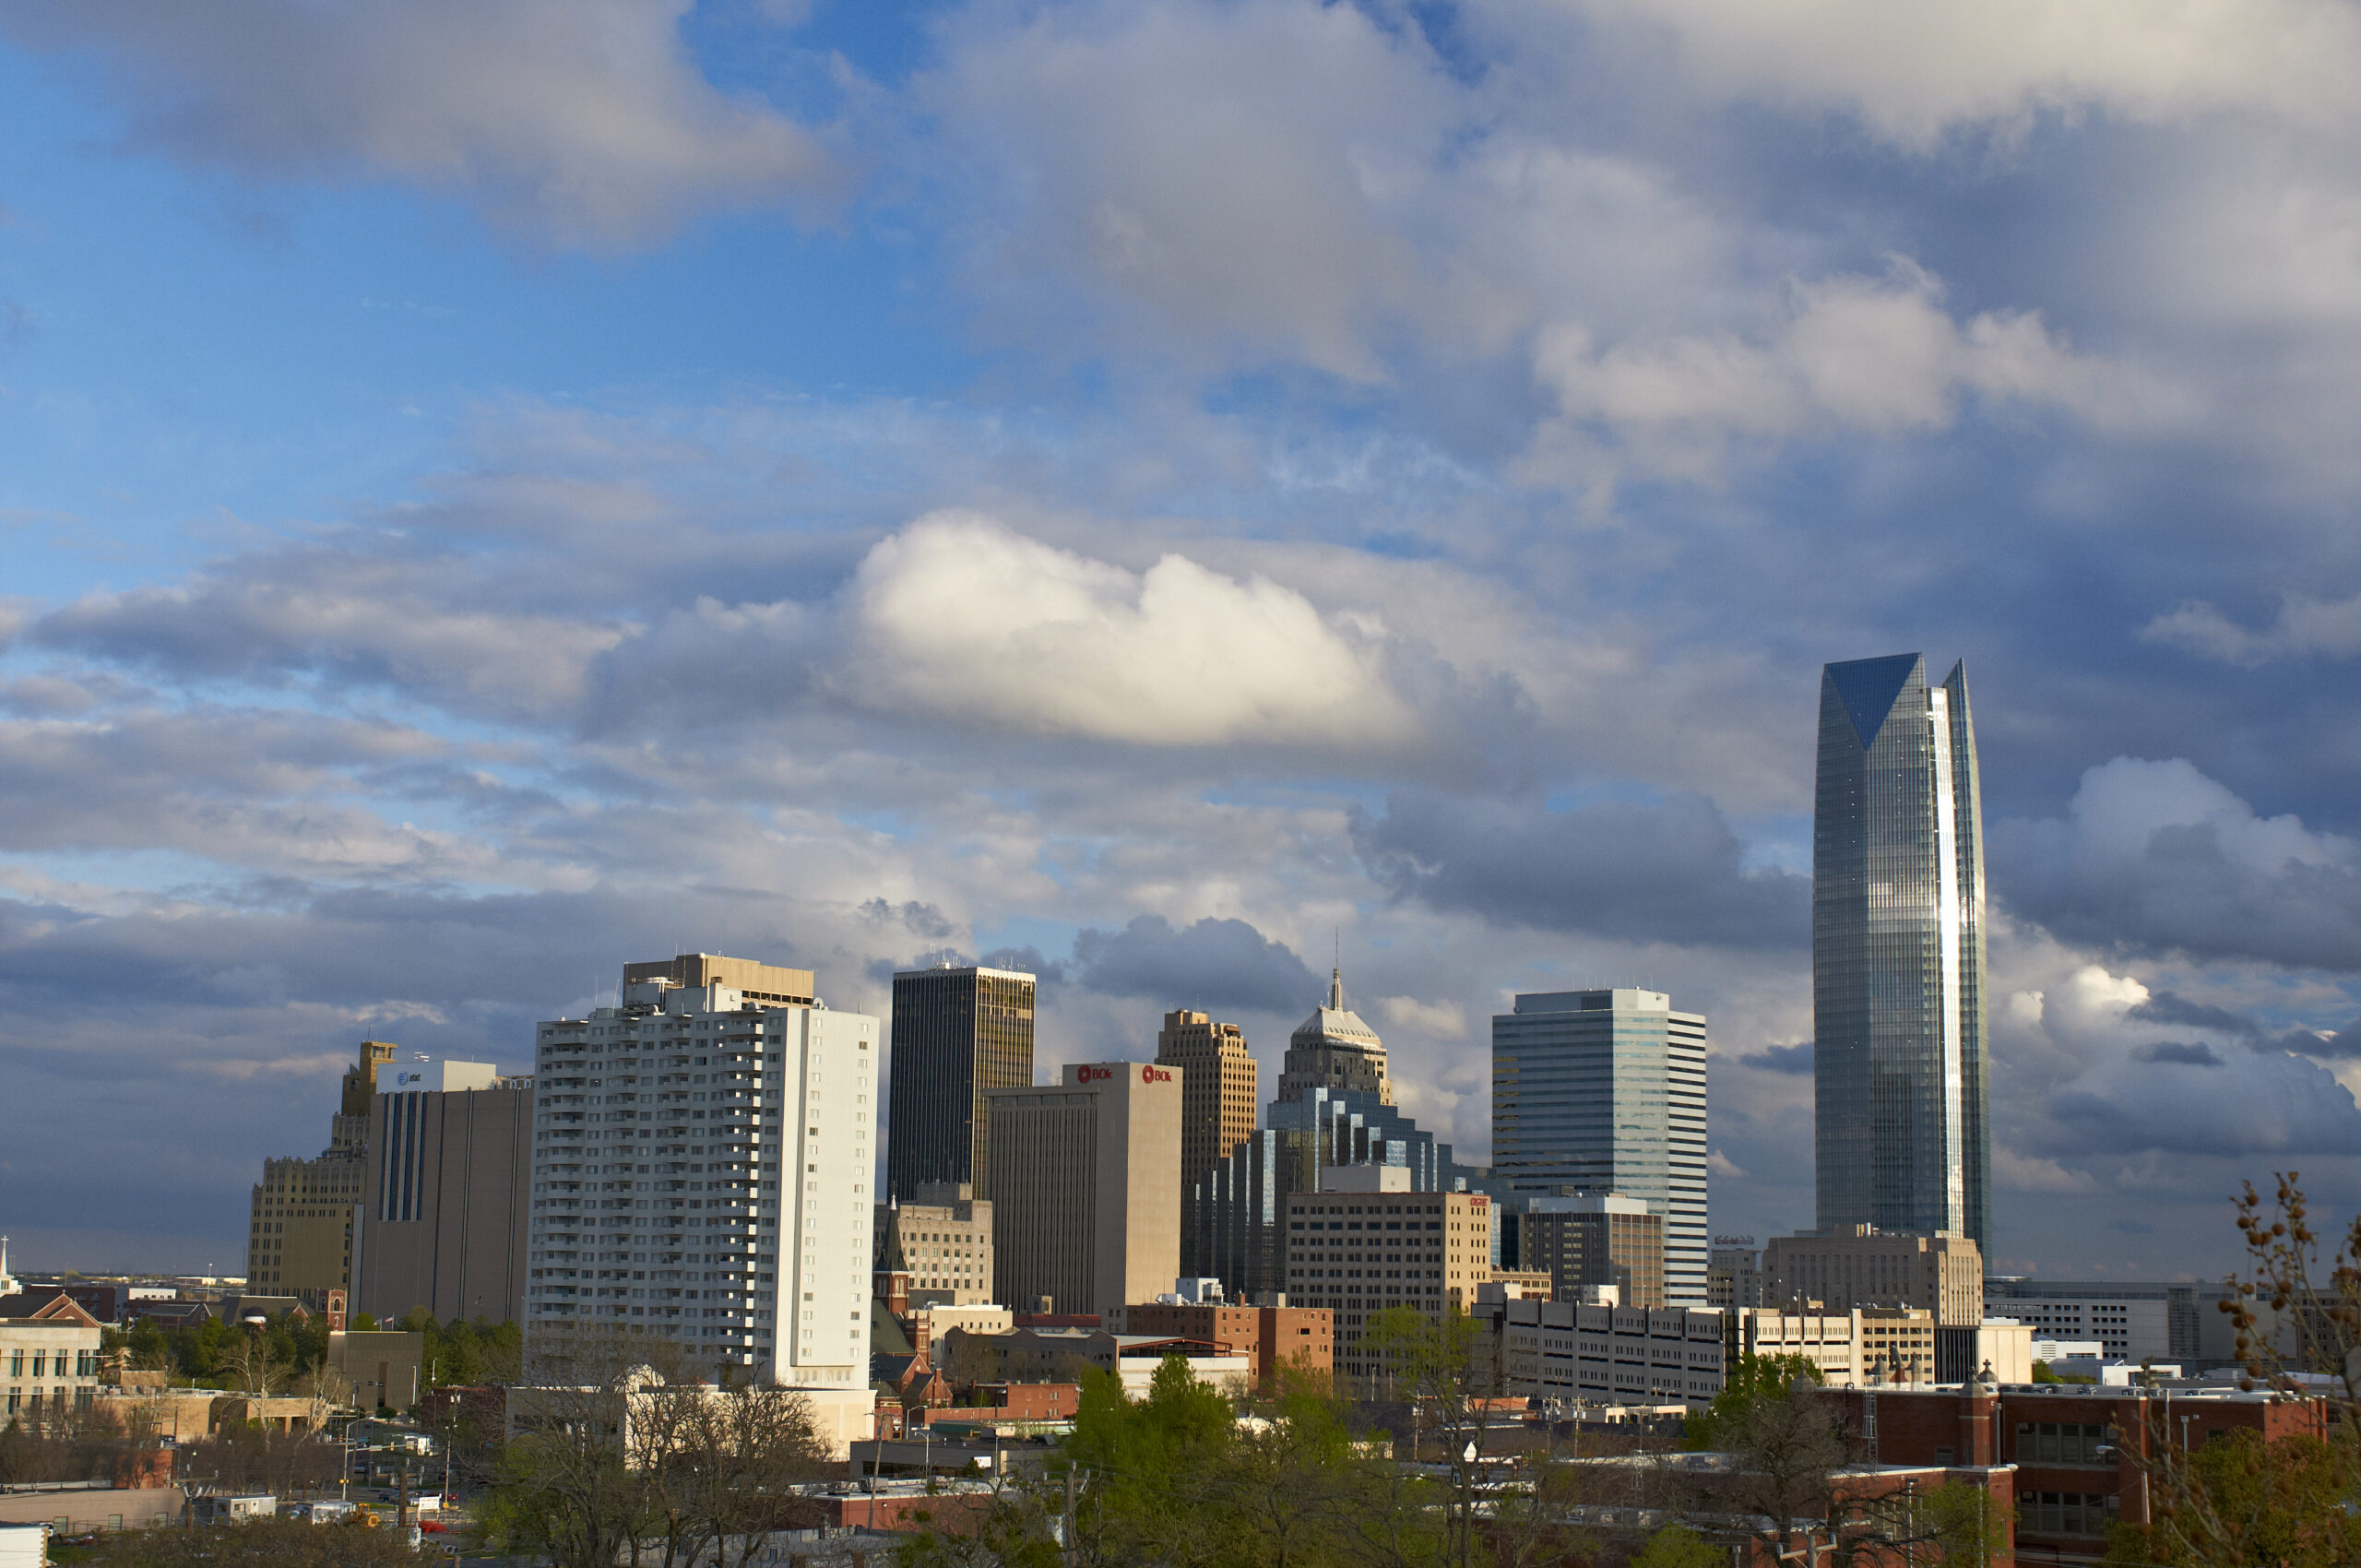 Downtown_Oklahoma_City_skyline_(2)